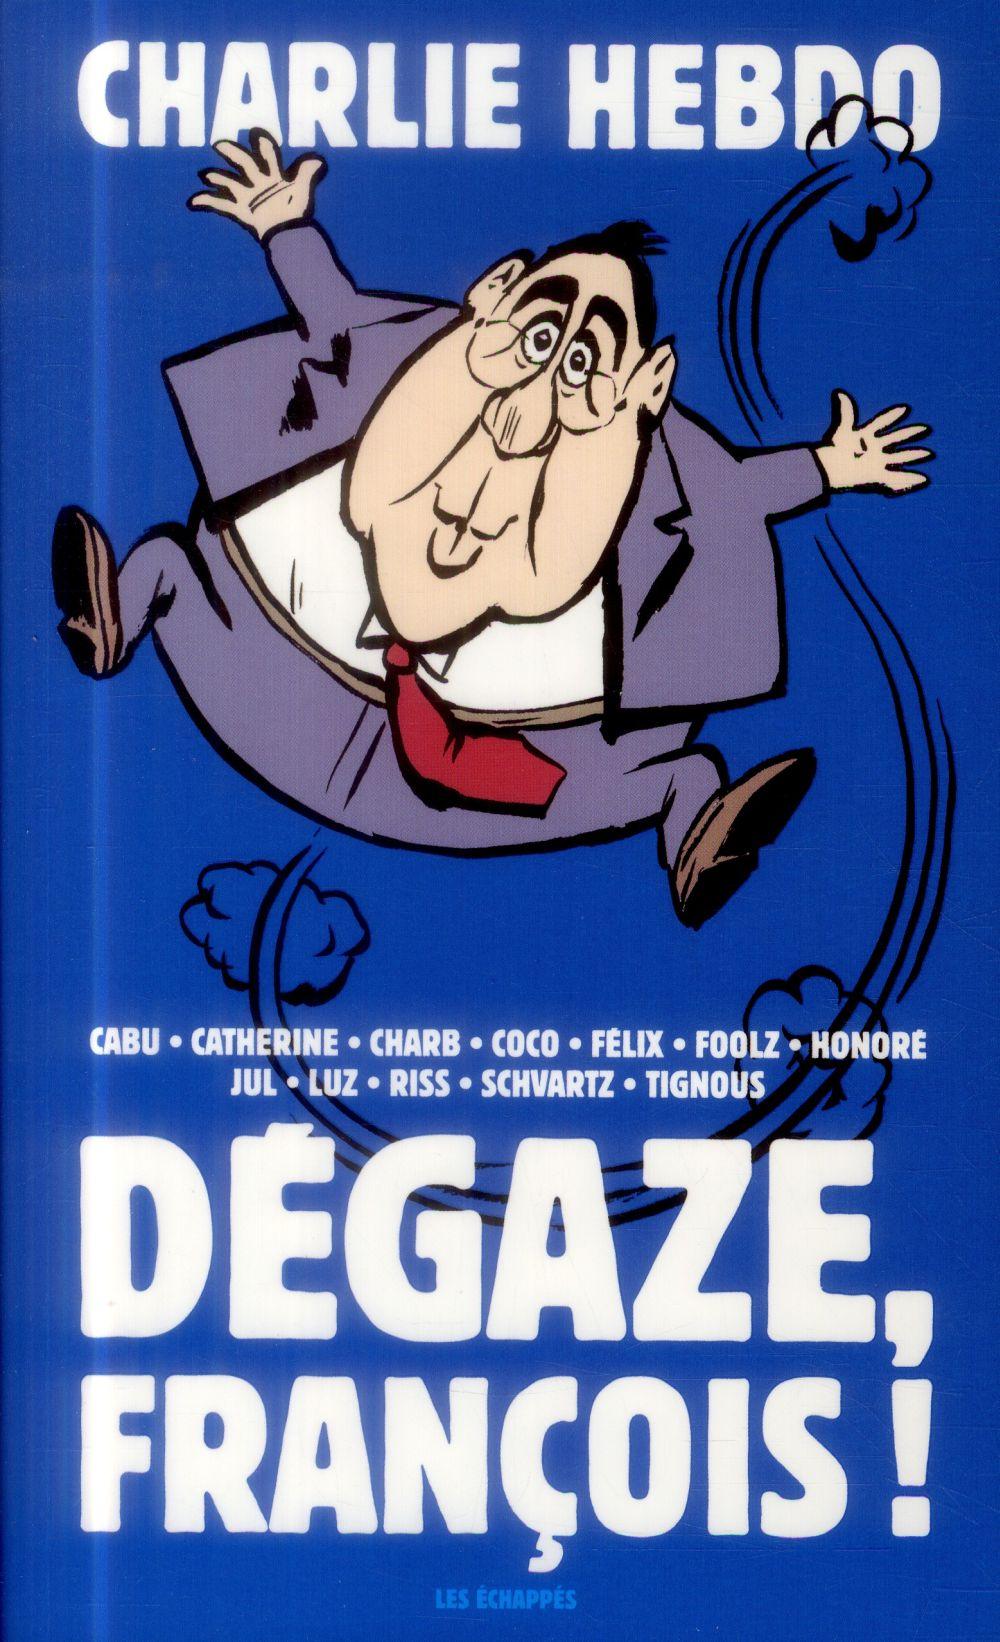 DEGAZE, FRANCOIS !